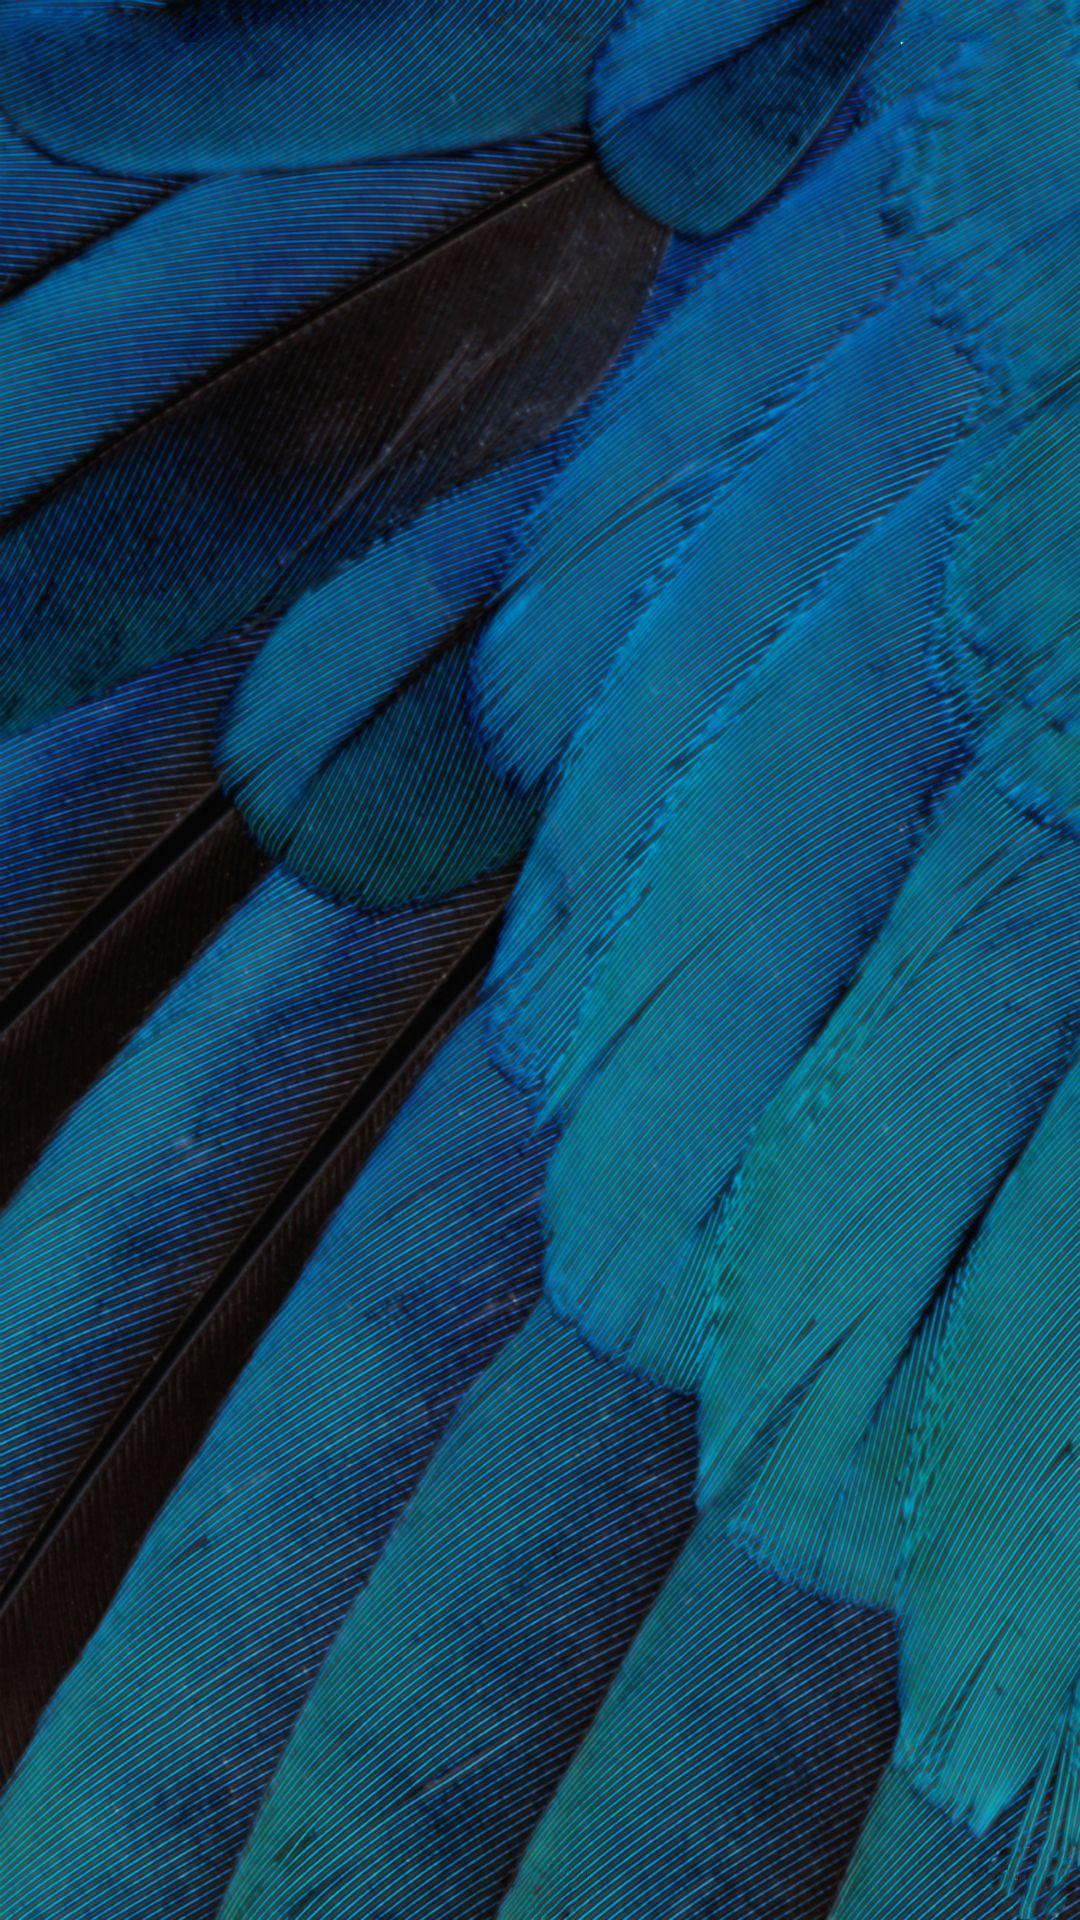 Ios9 Wallpaper Blue Feather Pattern Art Iphone 6 Wallpaper Download Iphone Wallpapers Ipad Wallpapers One Stop Download Pattern Art Blue Feather Wallpaper